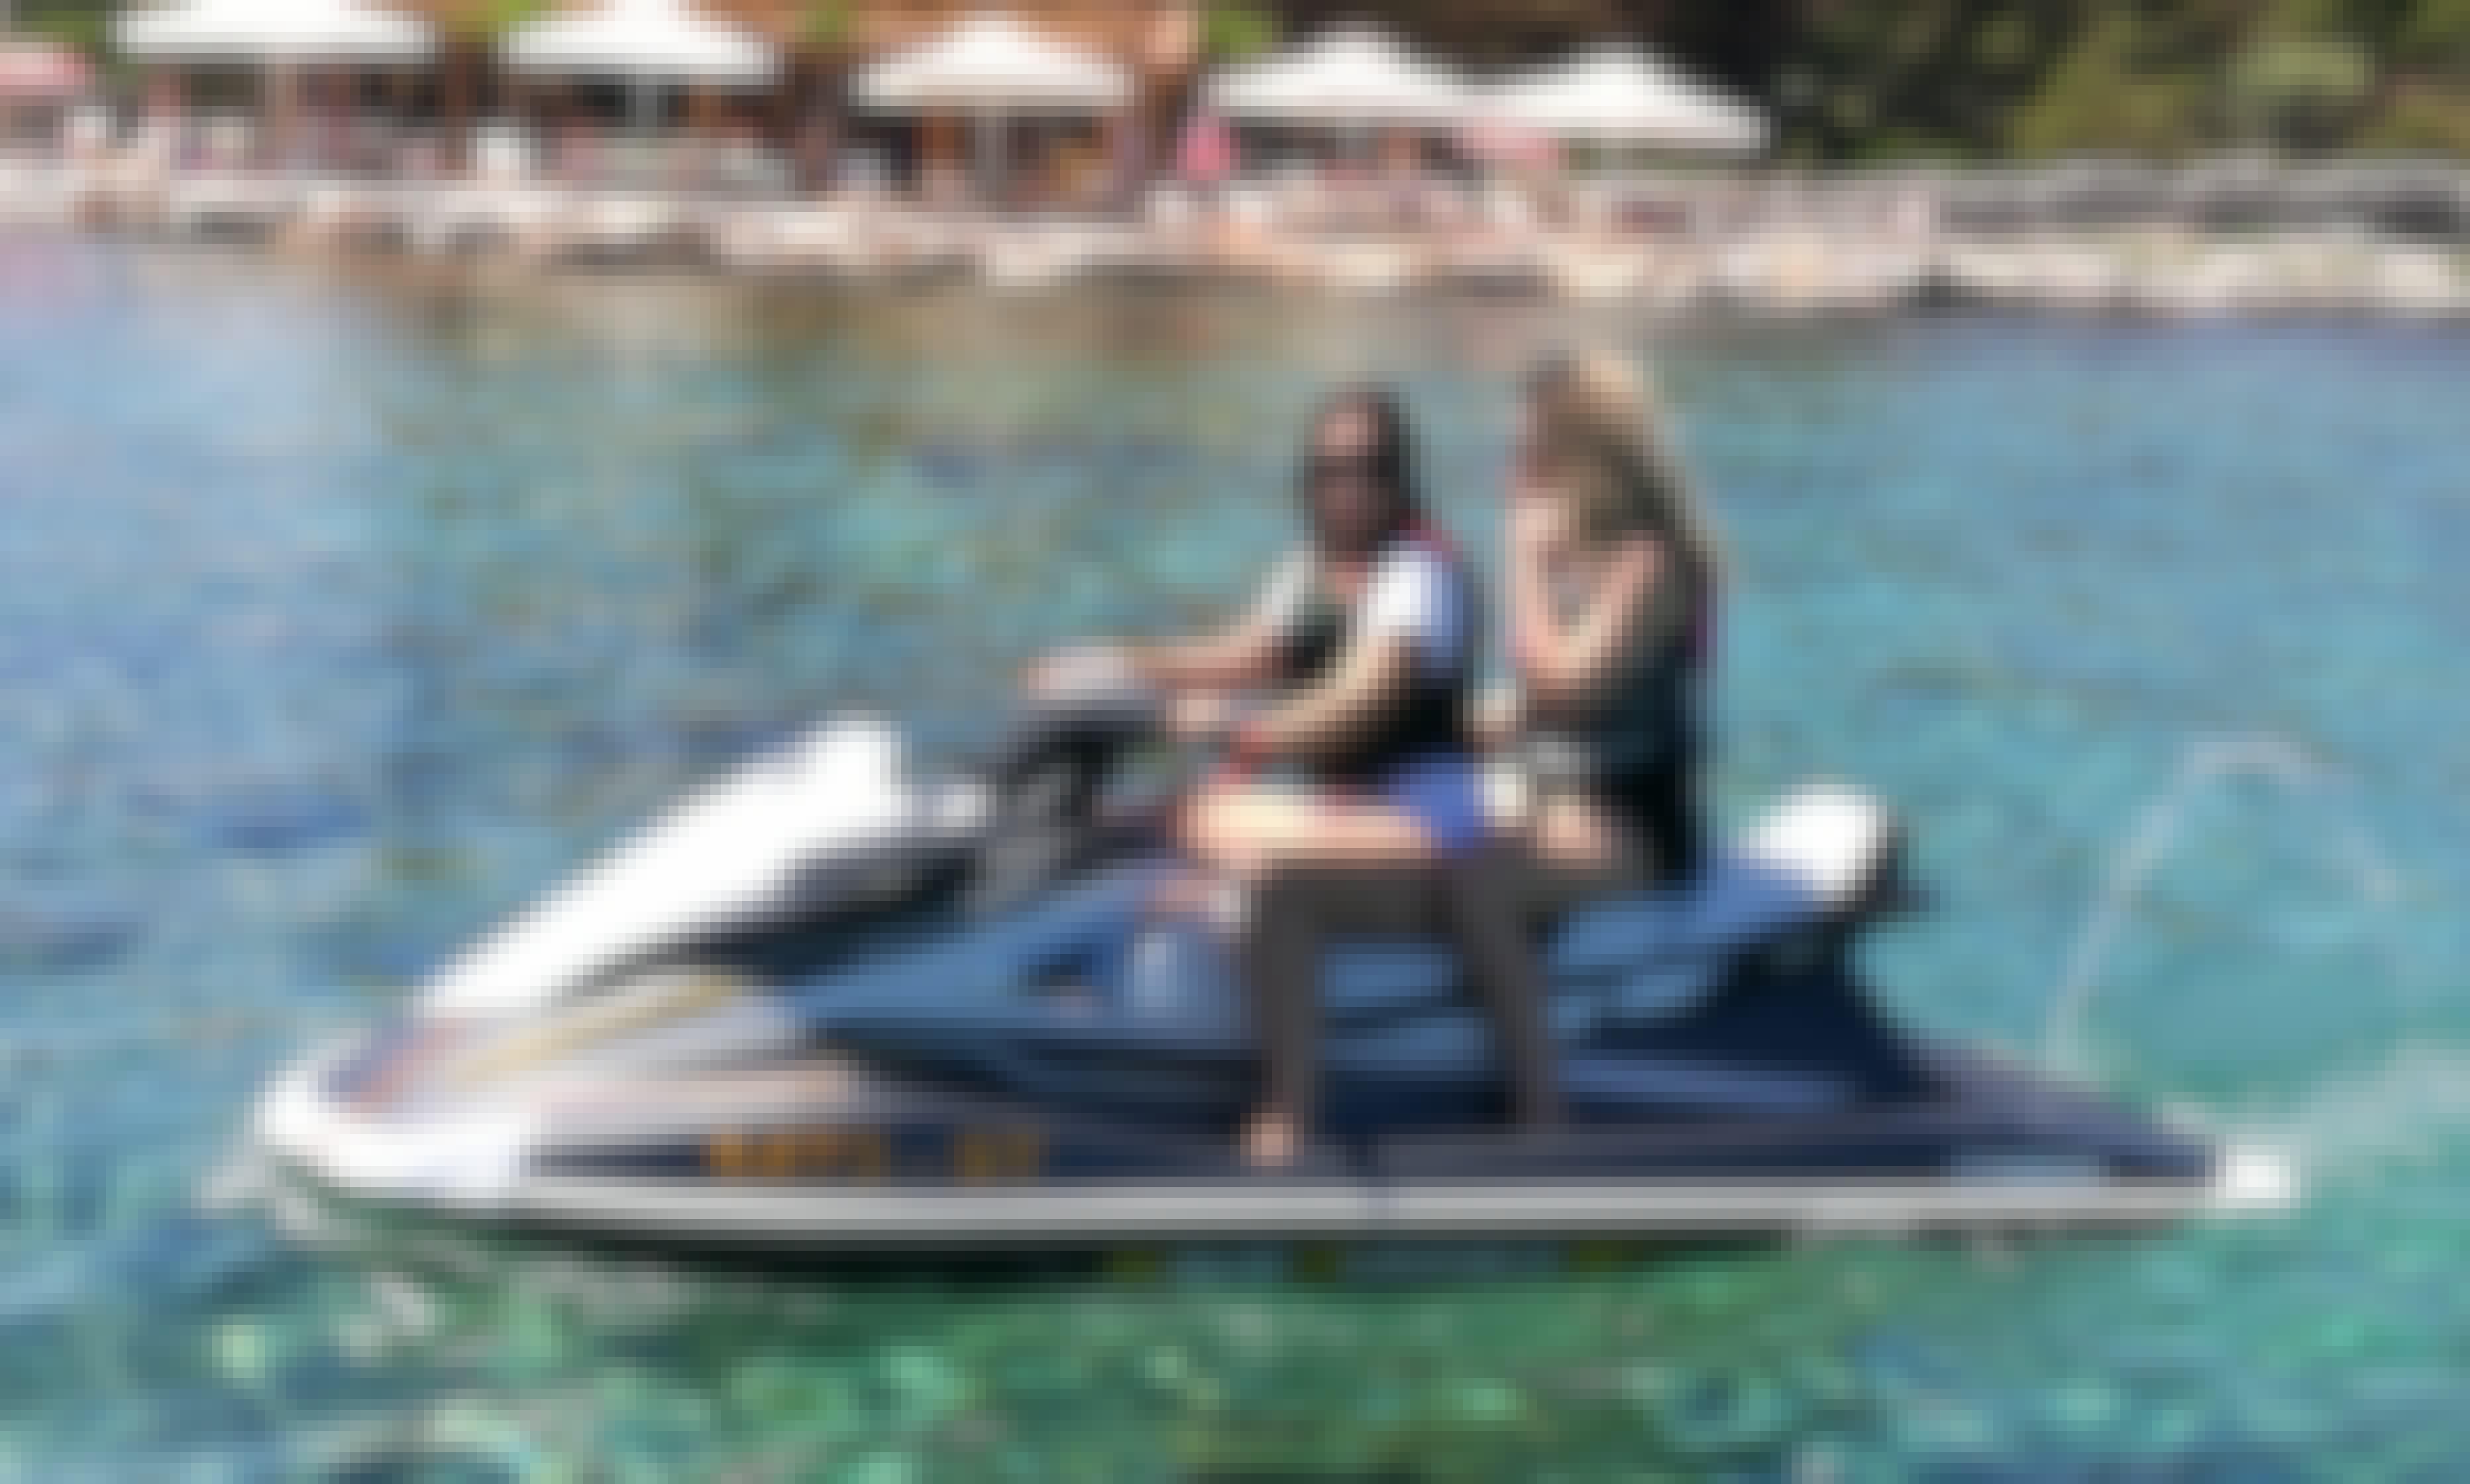 Yamaha VX 180hp Cruiser HO Jet Ski Rental in Vinišće, Splitsko-dalmatinska županija